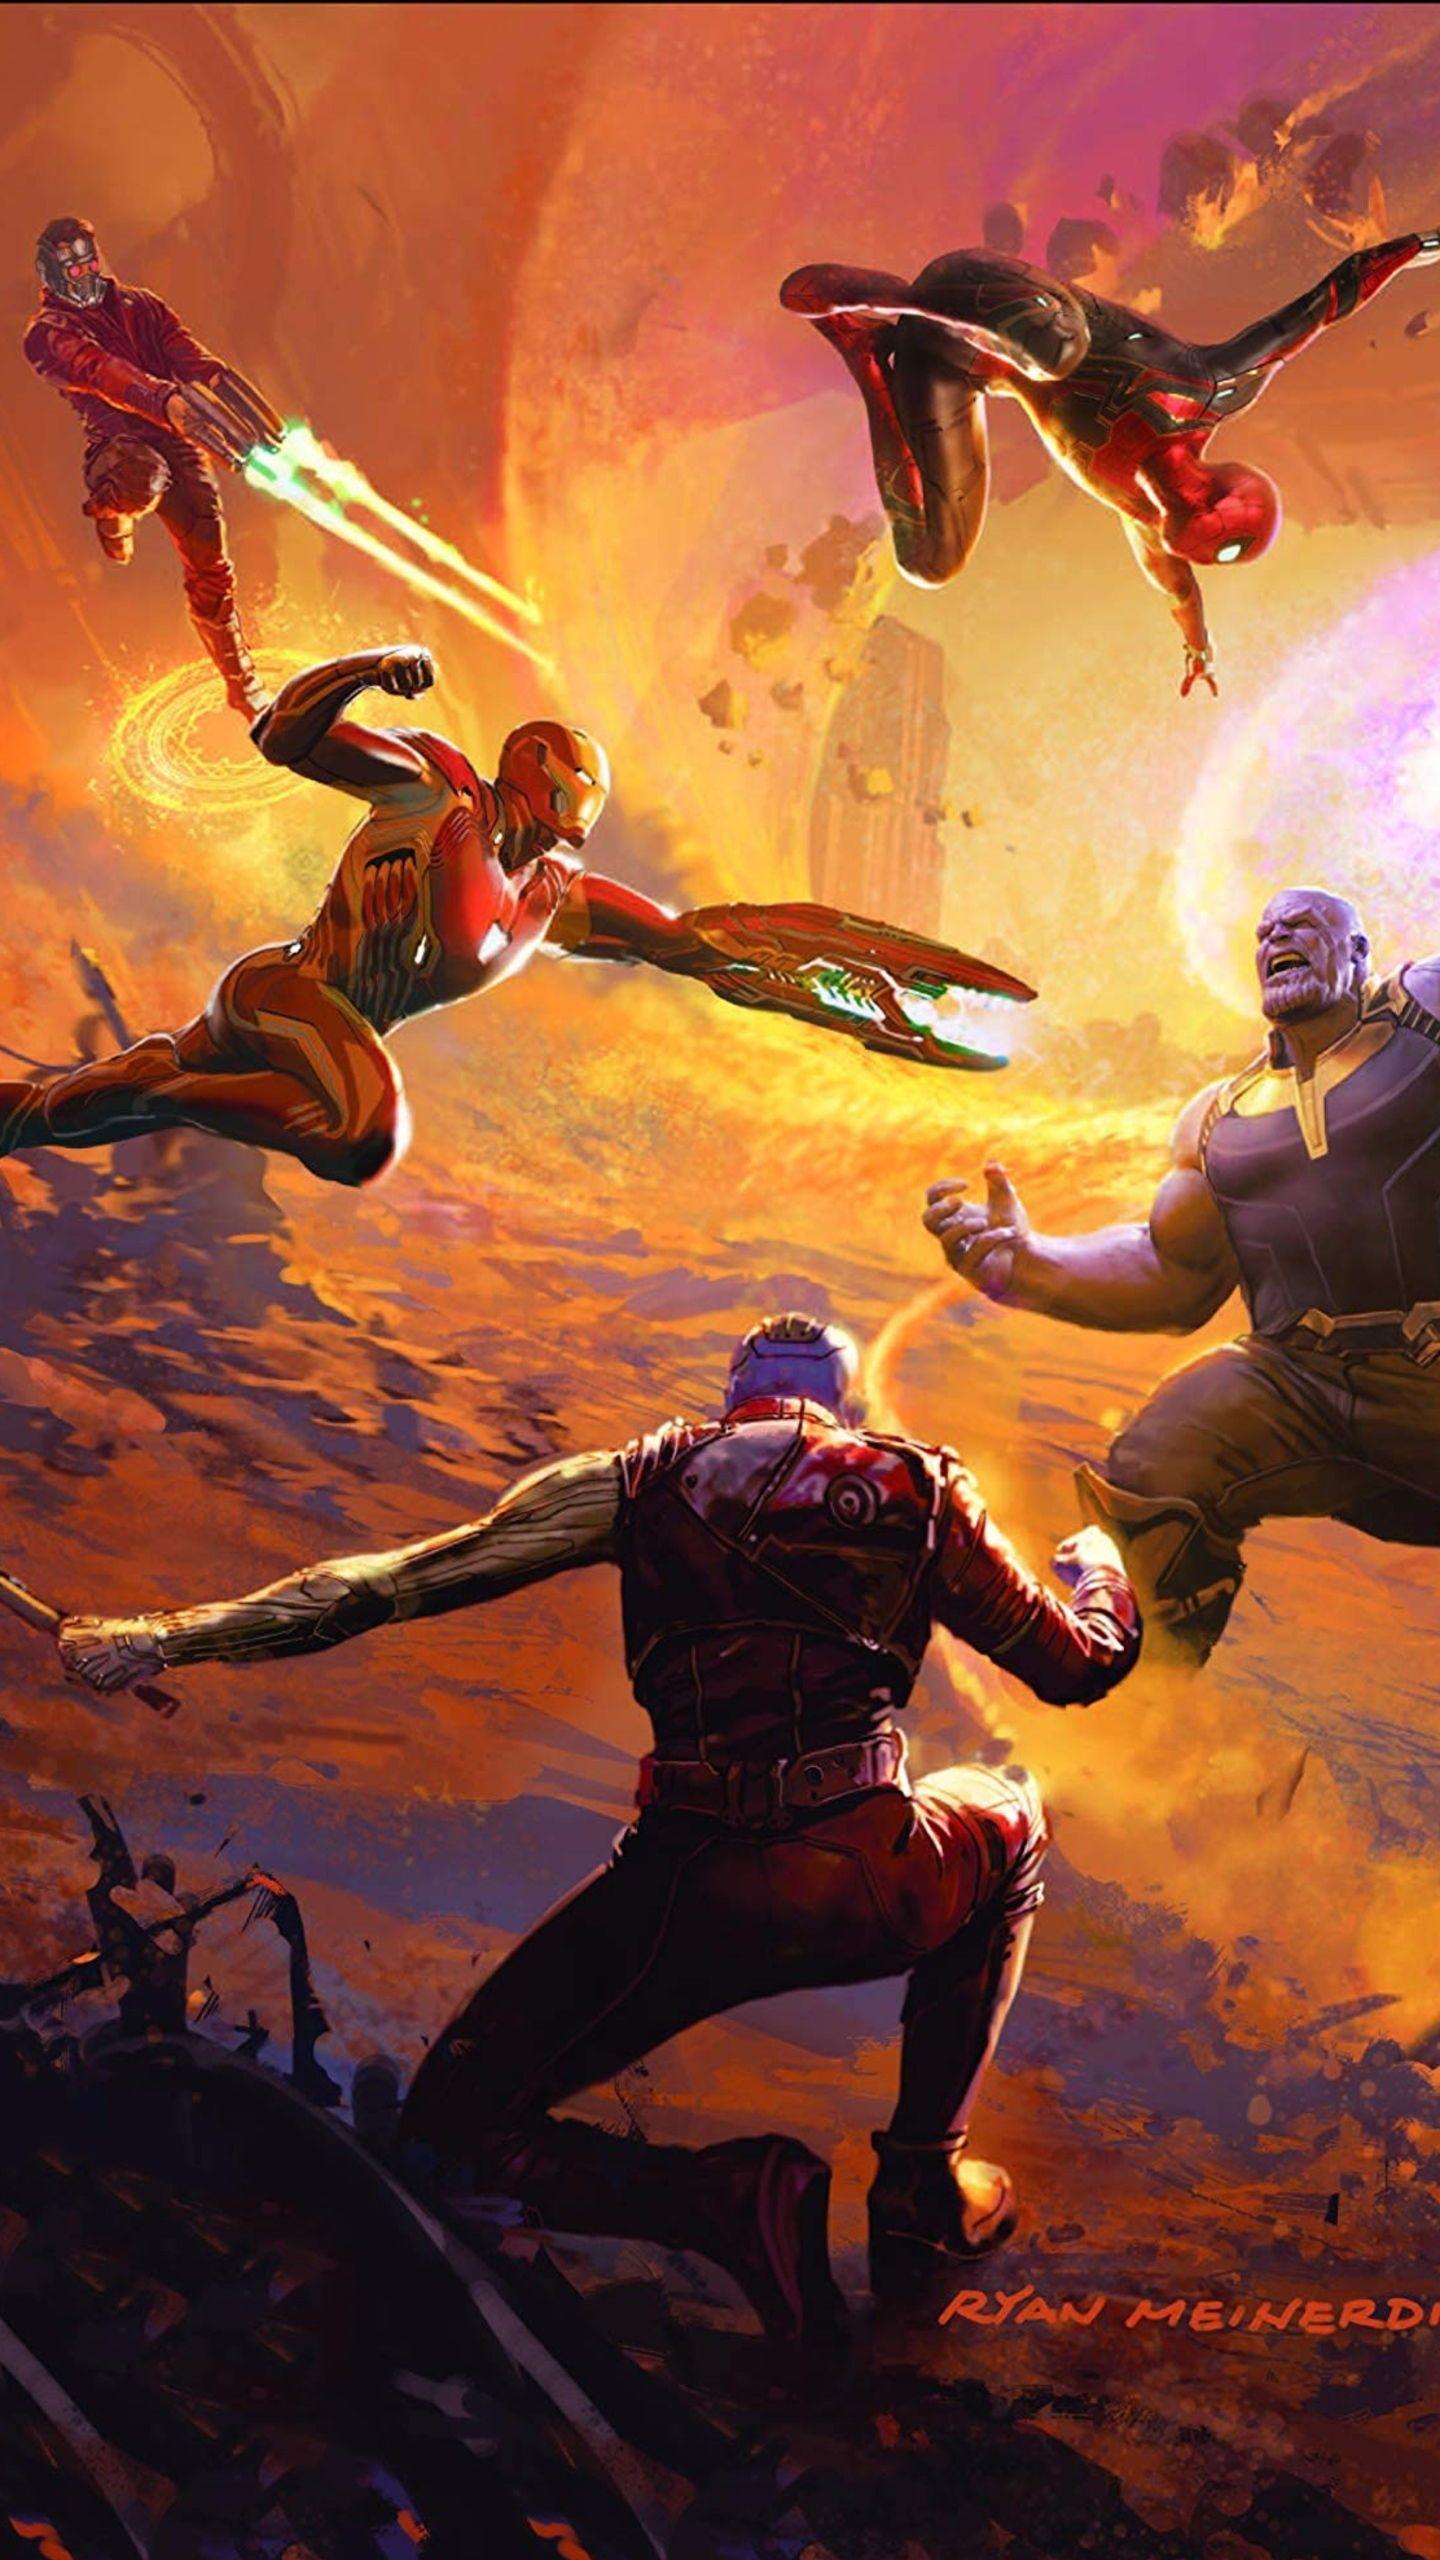 Download Wallpapers Thanos Art 2018 Movie Superheroes Avengers Infinity War Besthqwallpapers Com Stone Artwork War Art Soul Stone